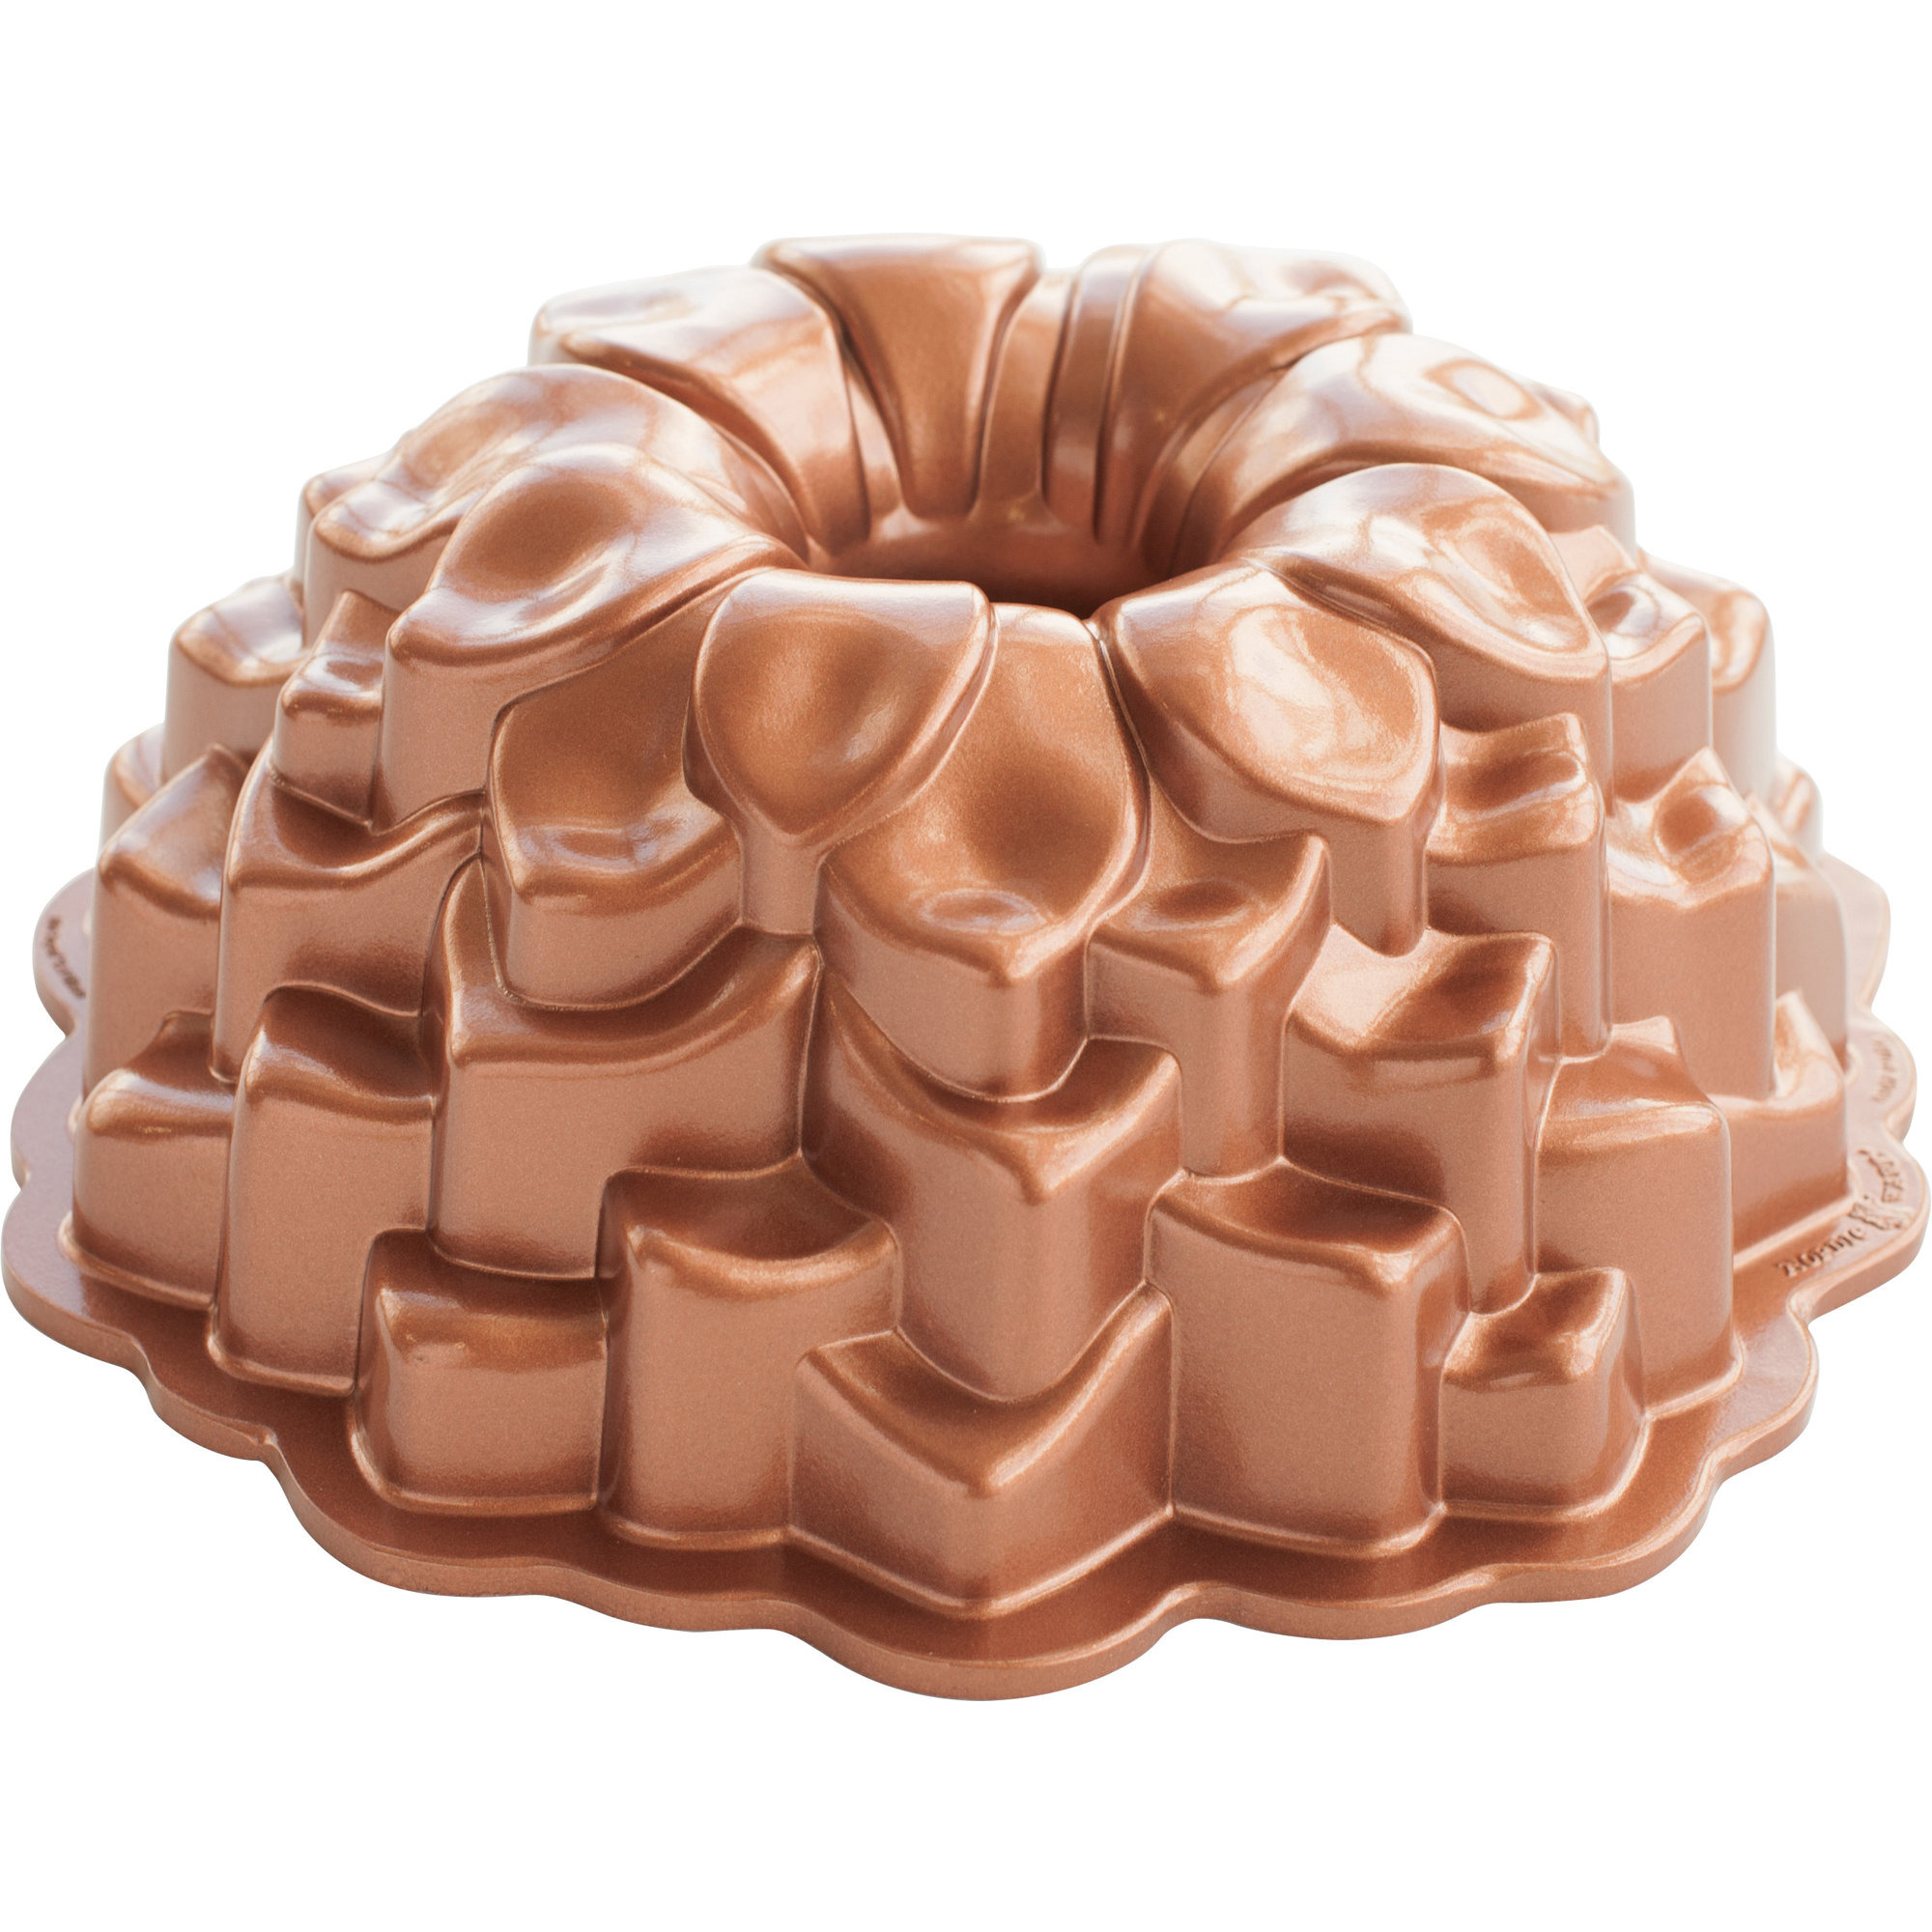 Nordic Ware Kakform Blossom